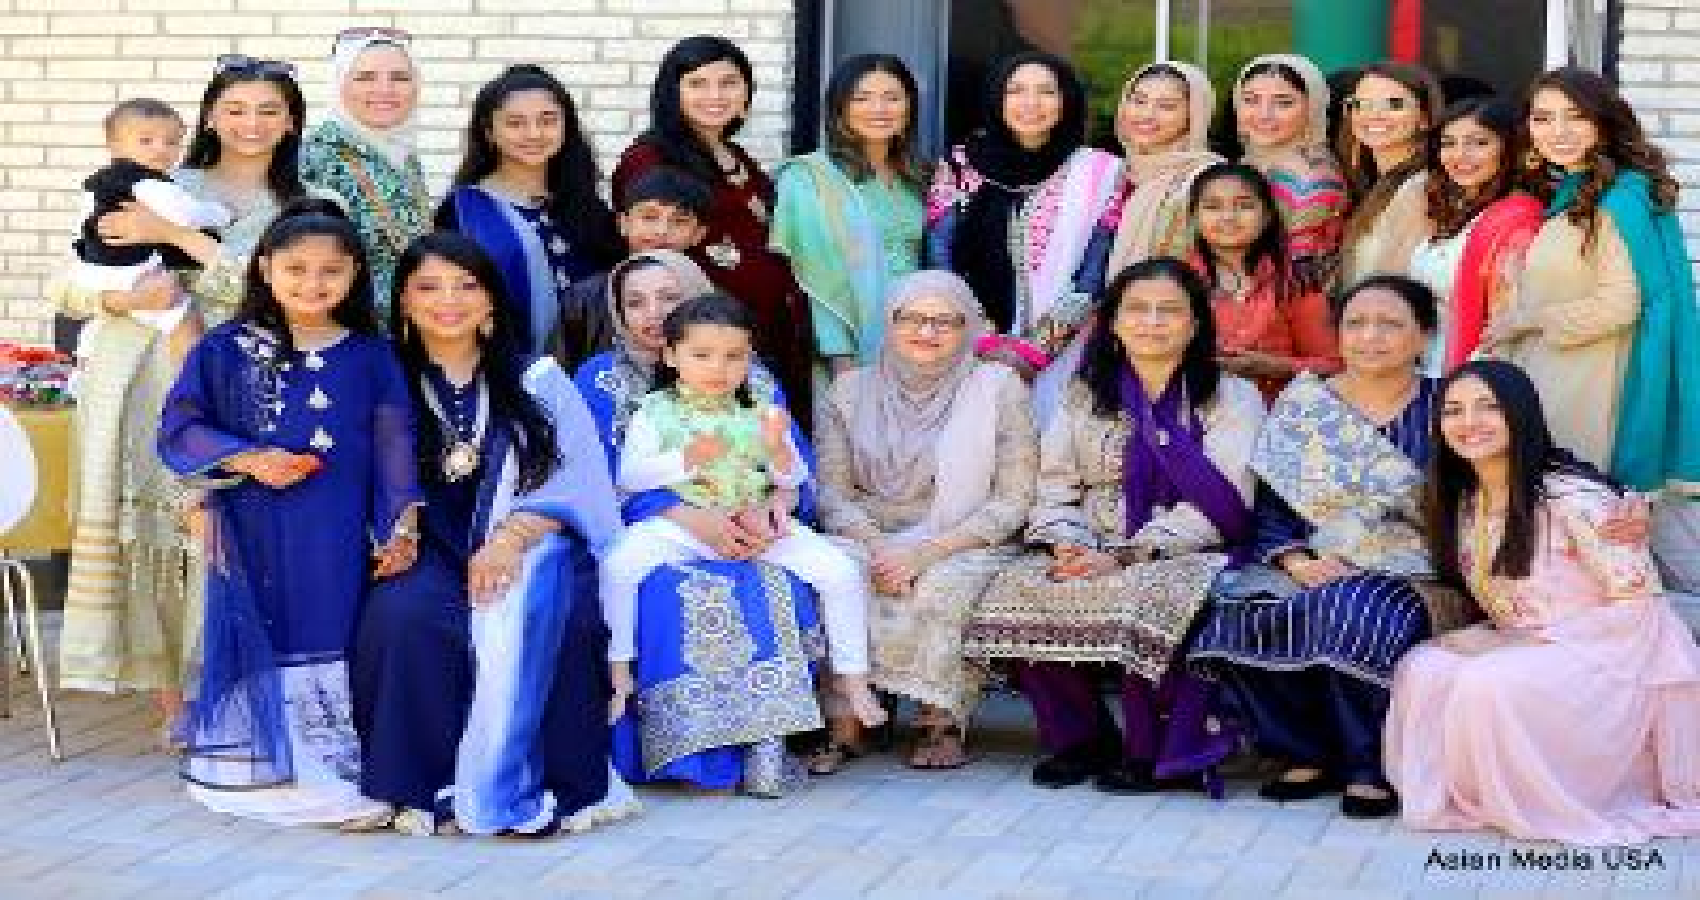 Chicago's Community Stalwart Iftekhar Shareef Hosts EID Reception